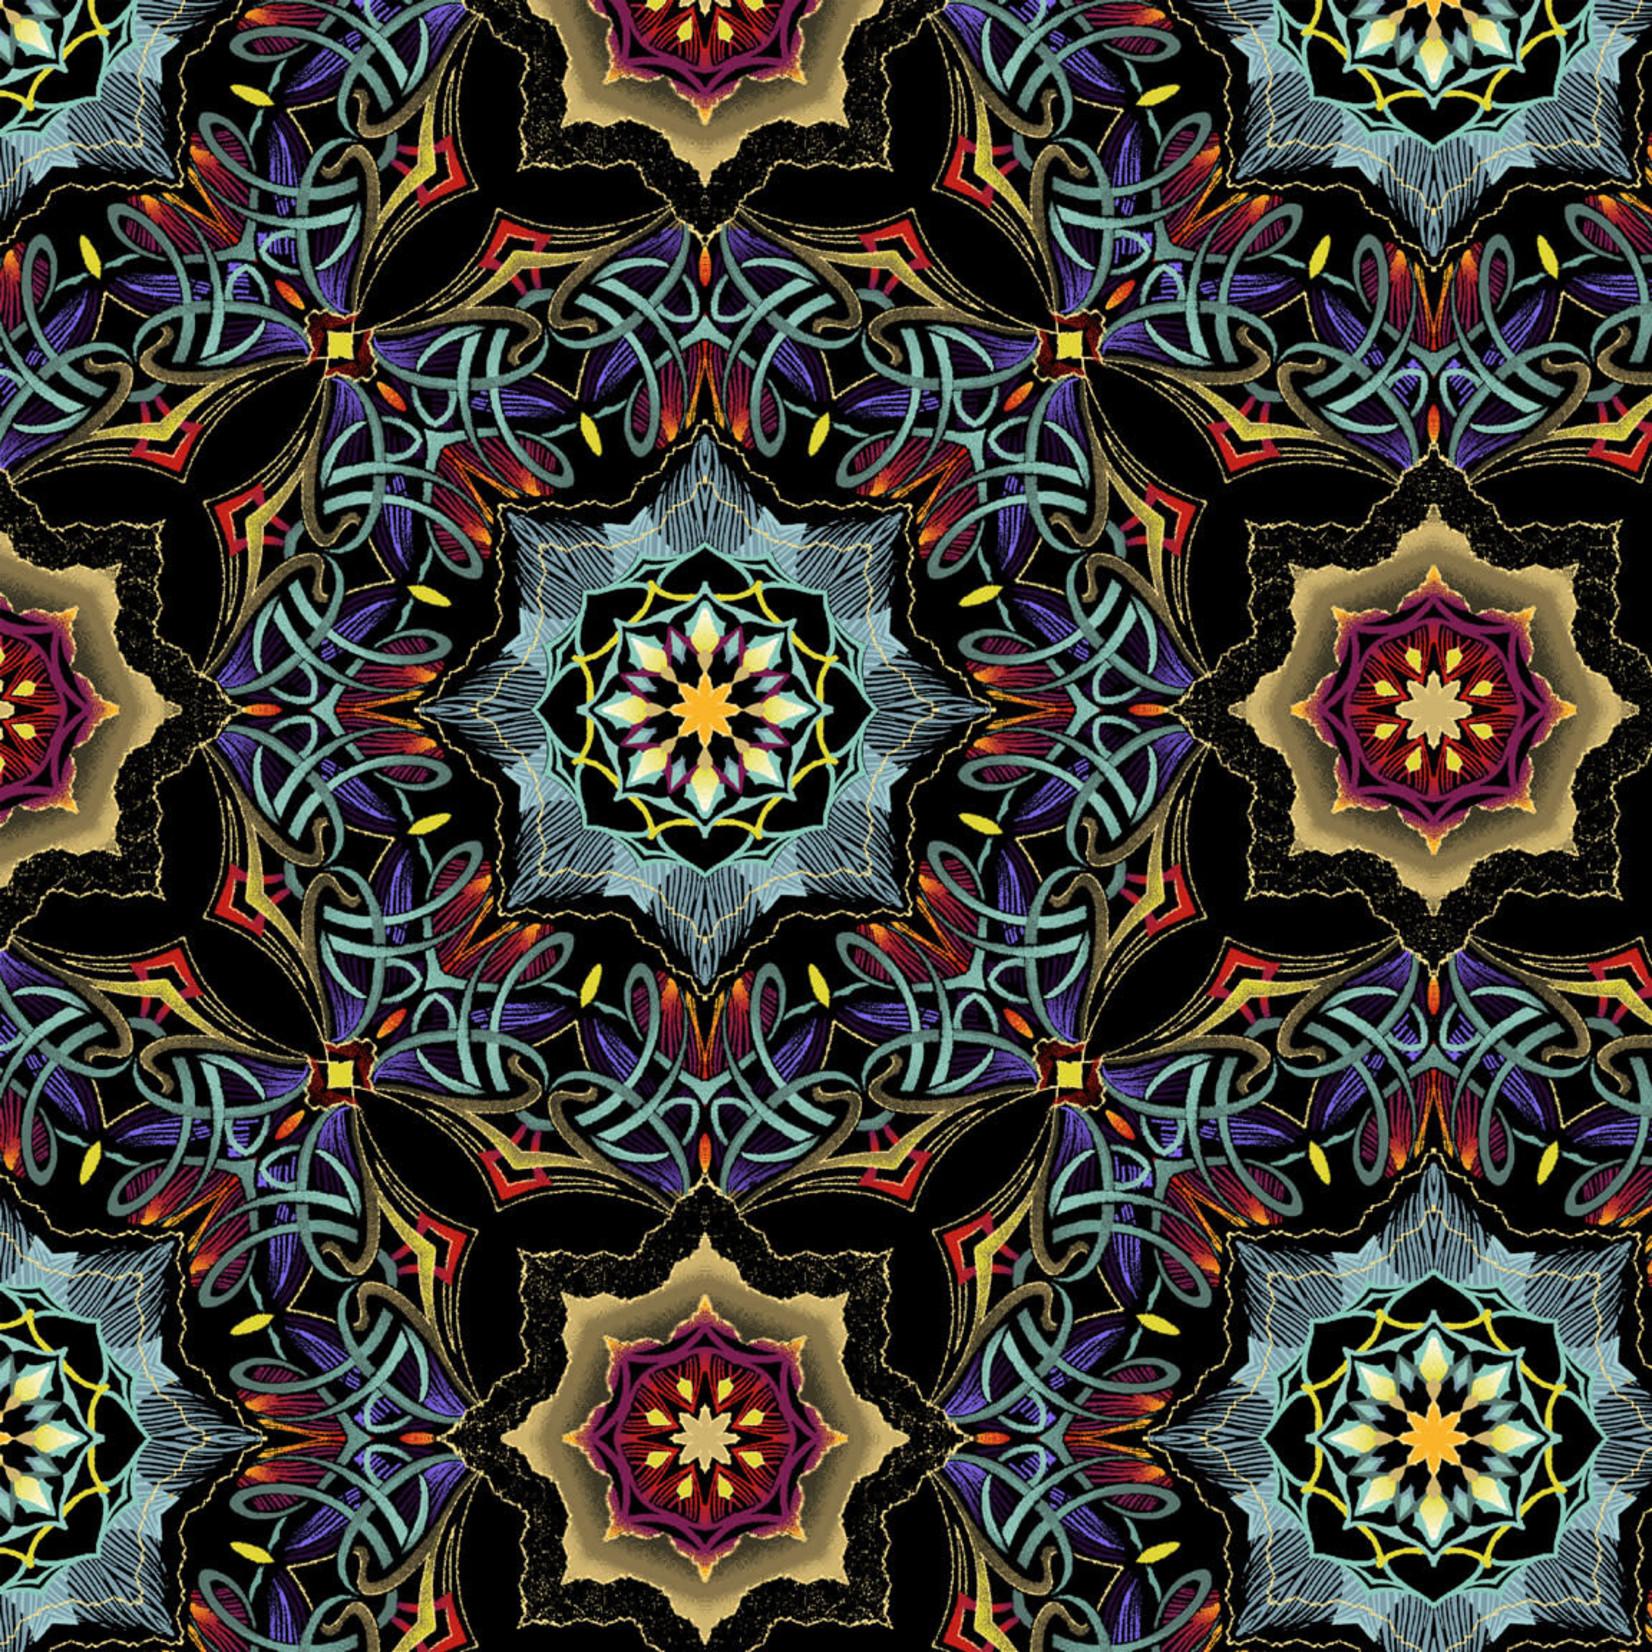 Windham Fabrics Grand Illusion - Mandalas - Multi/Black